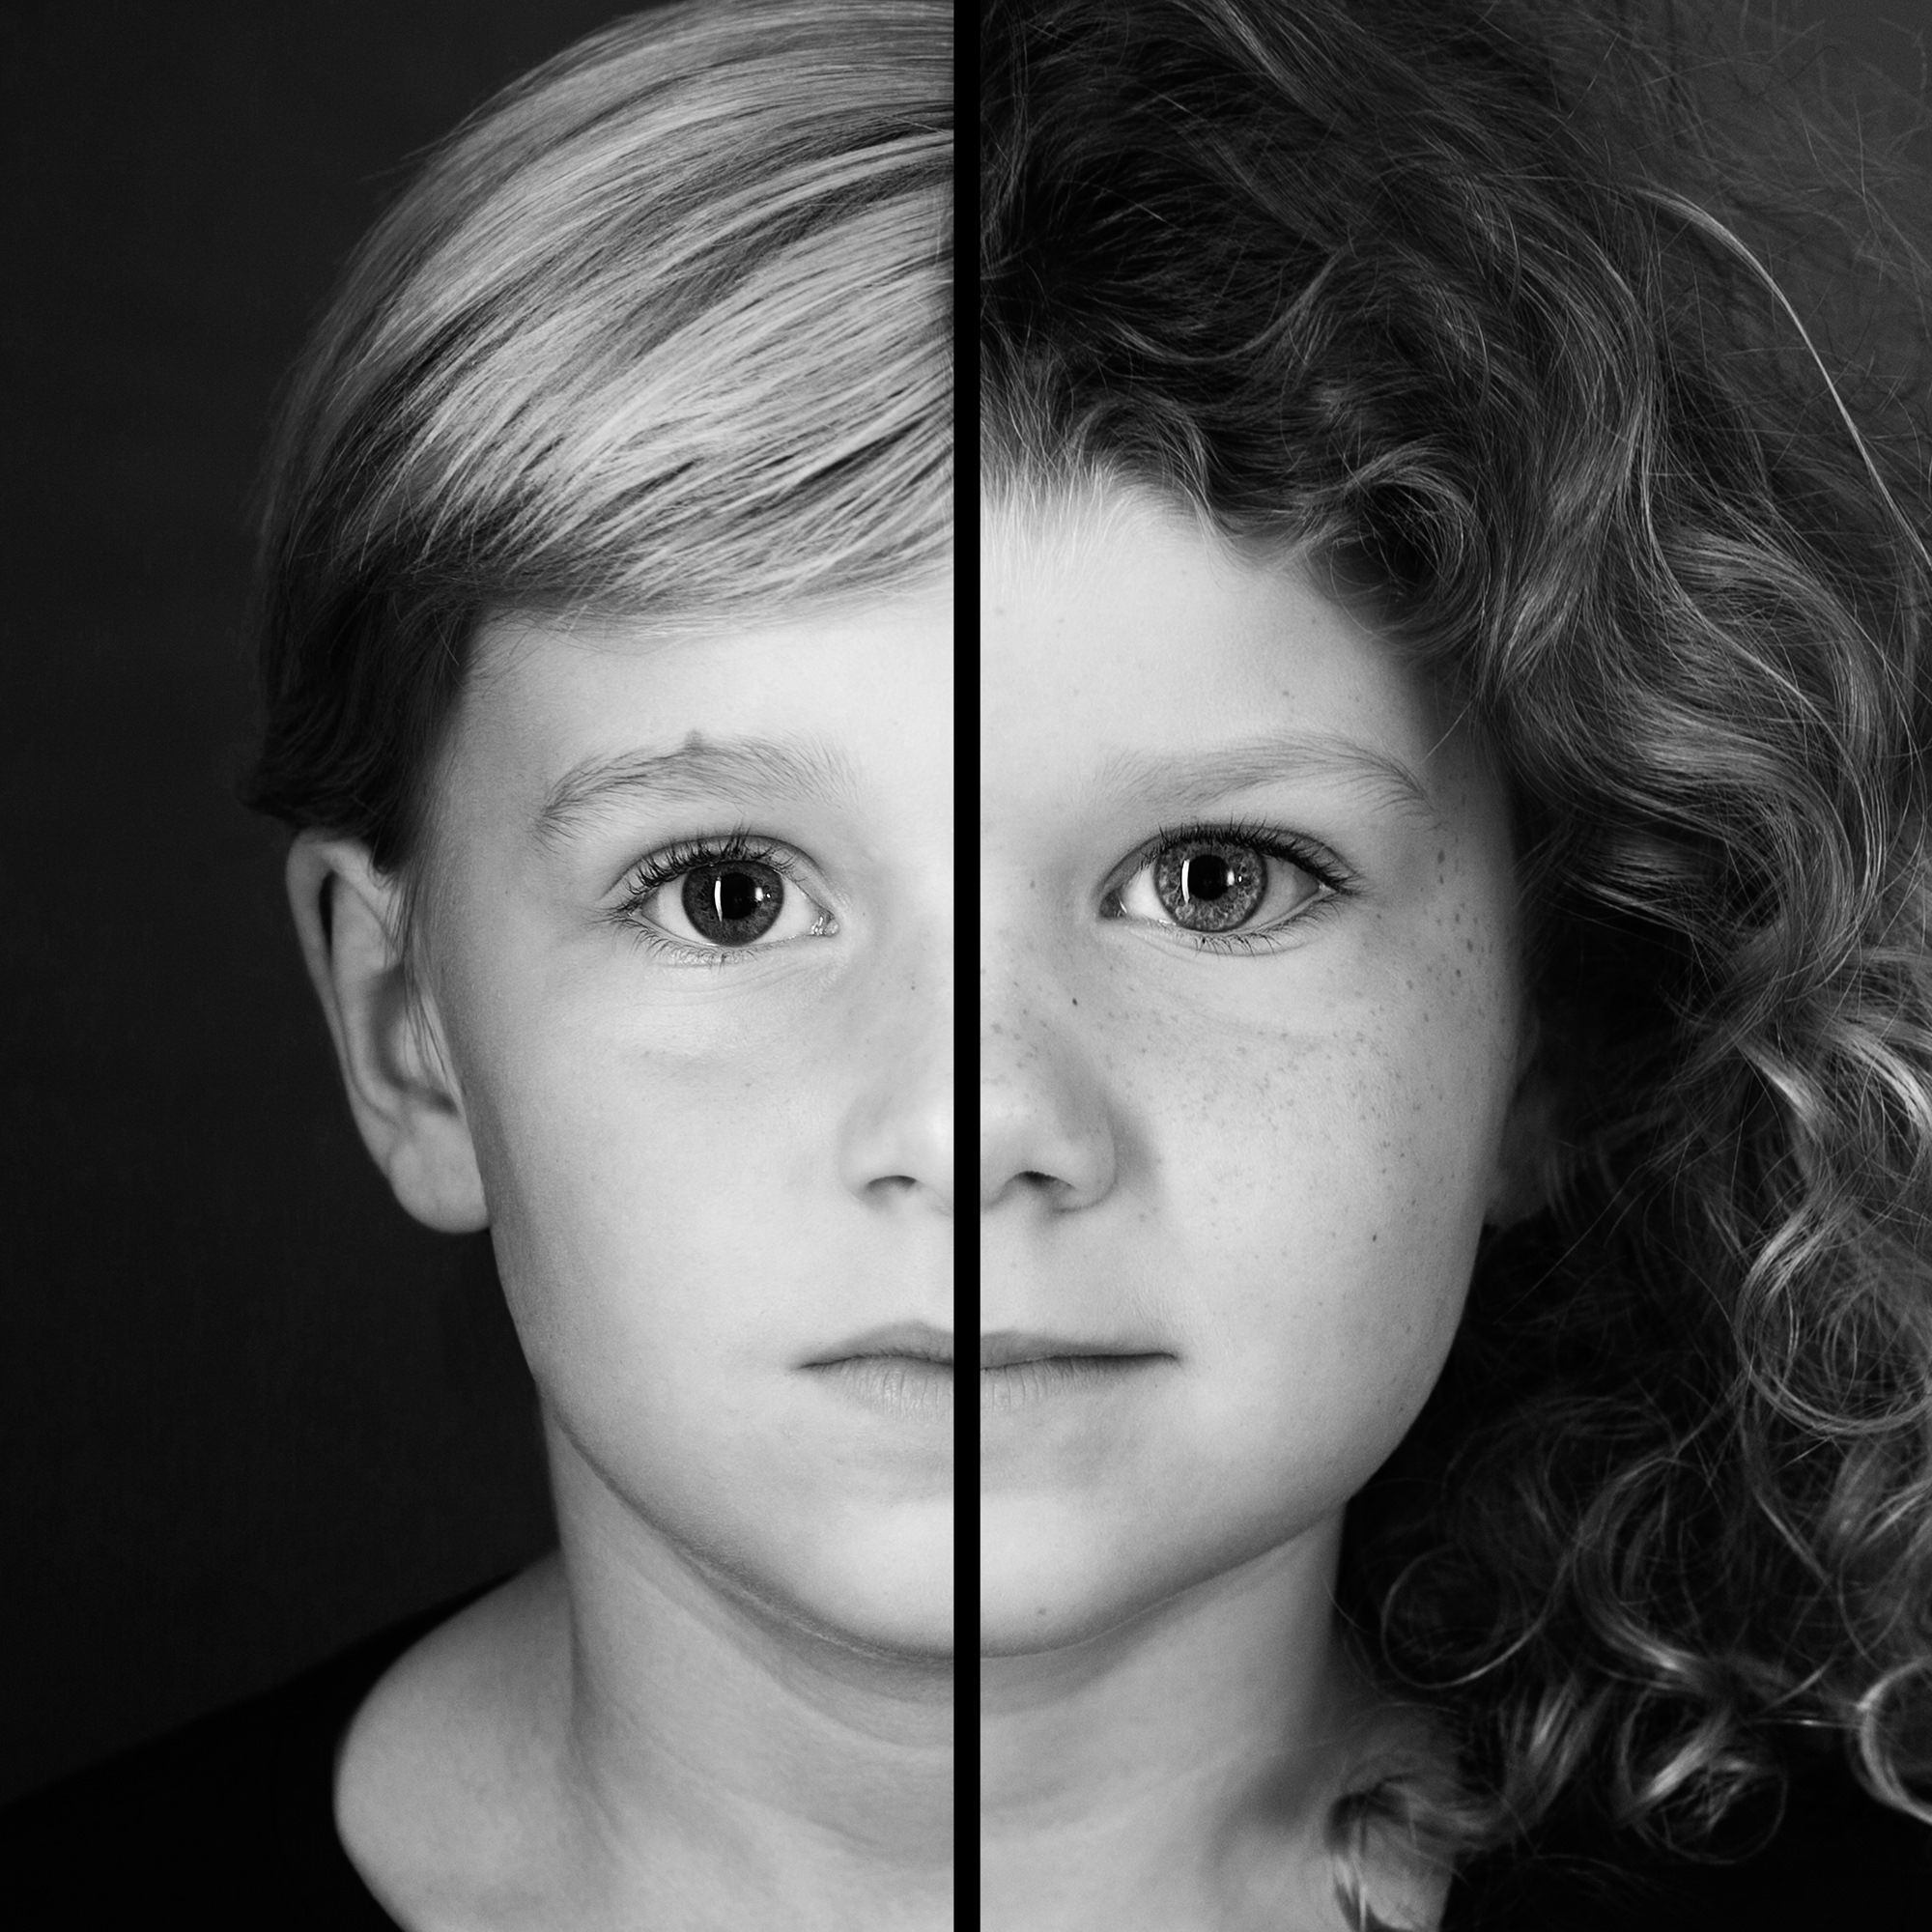 zwart-wit familie portret